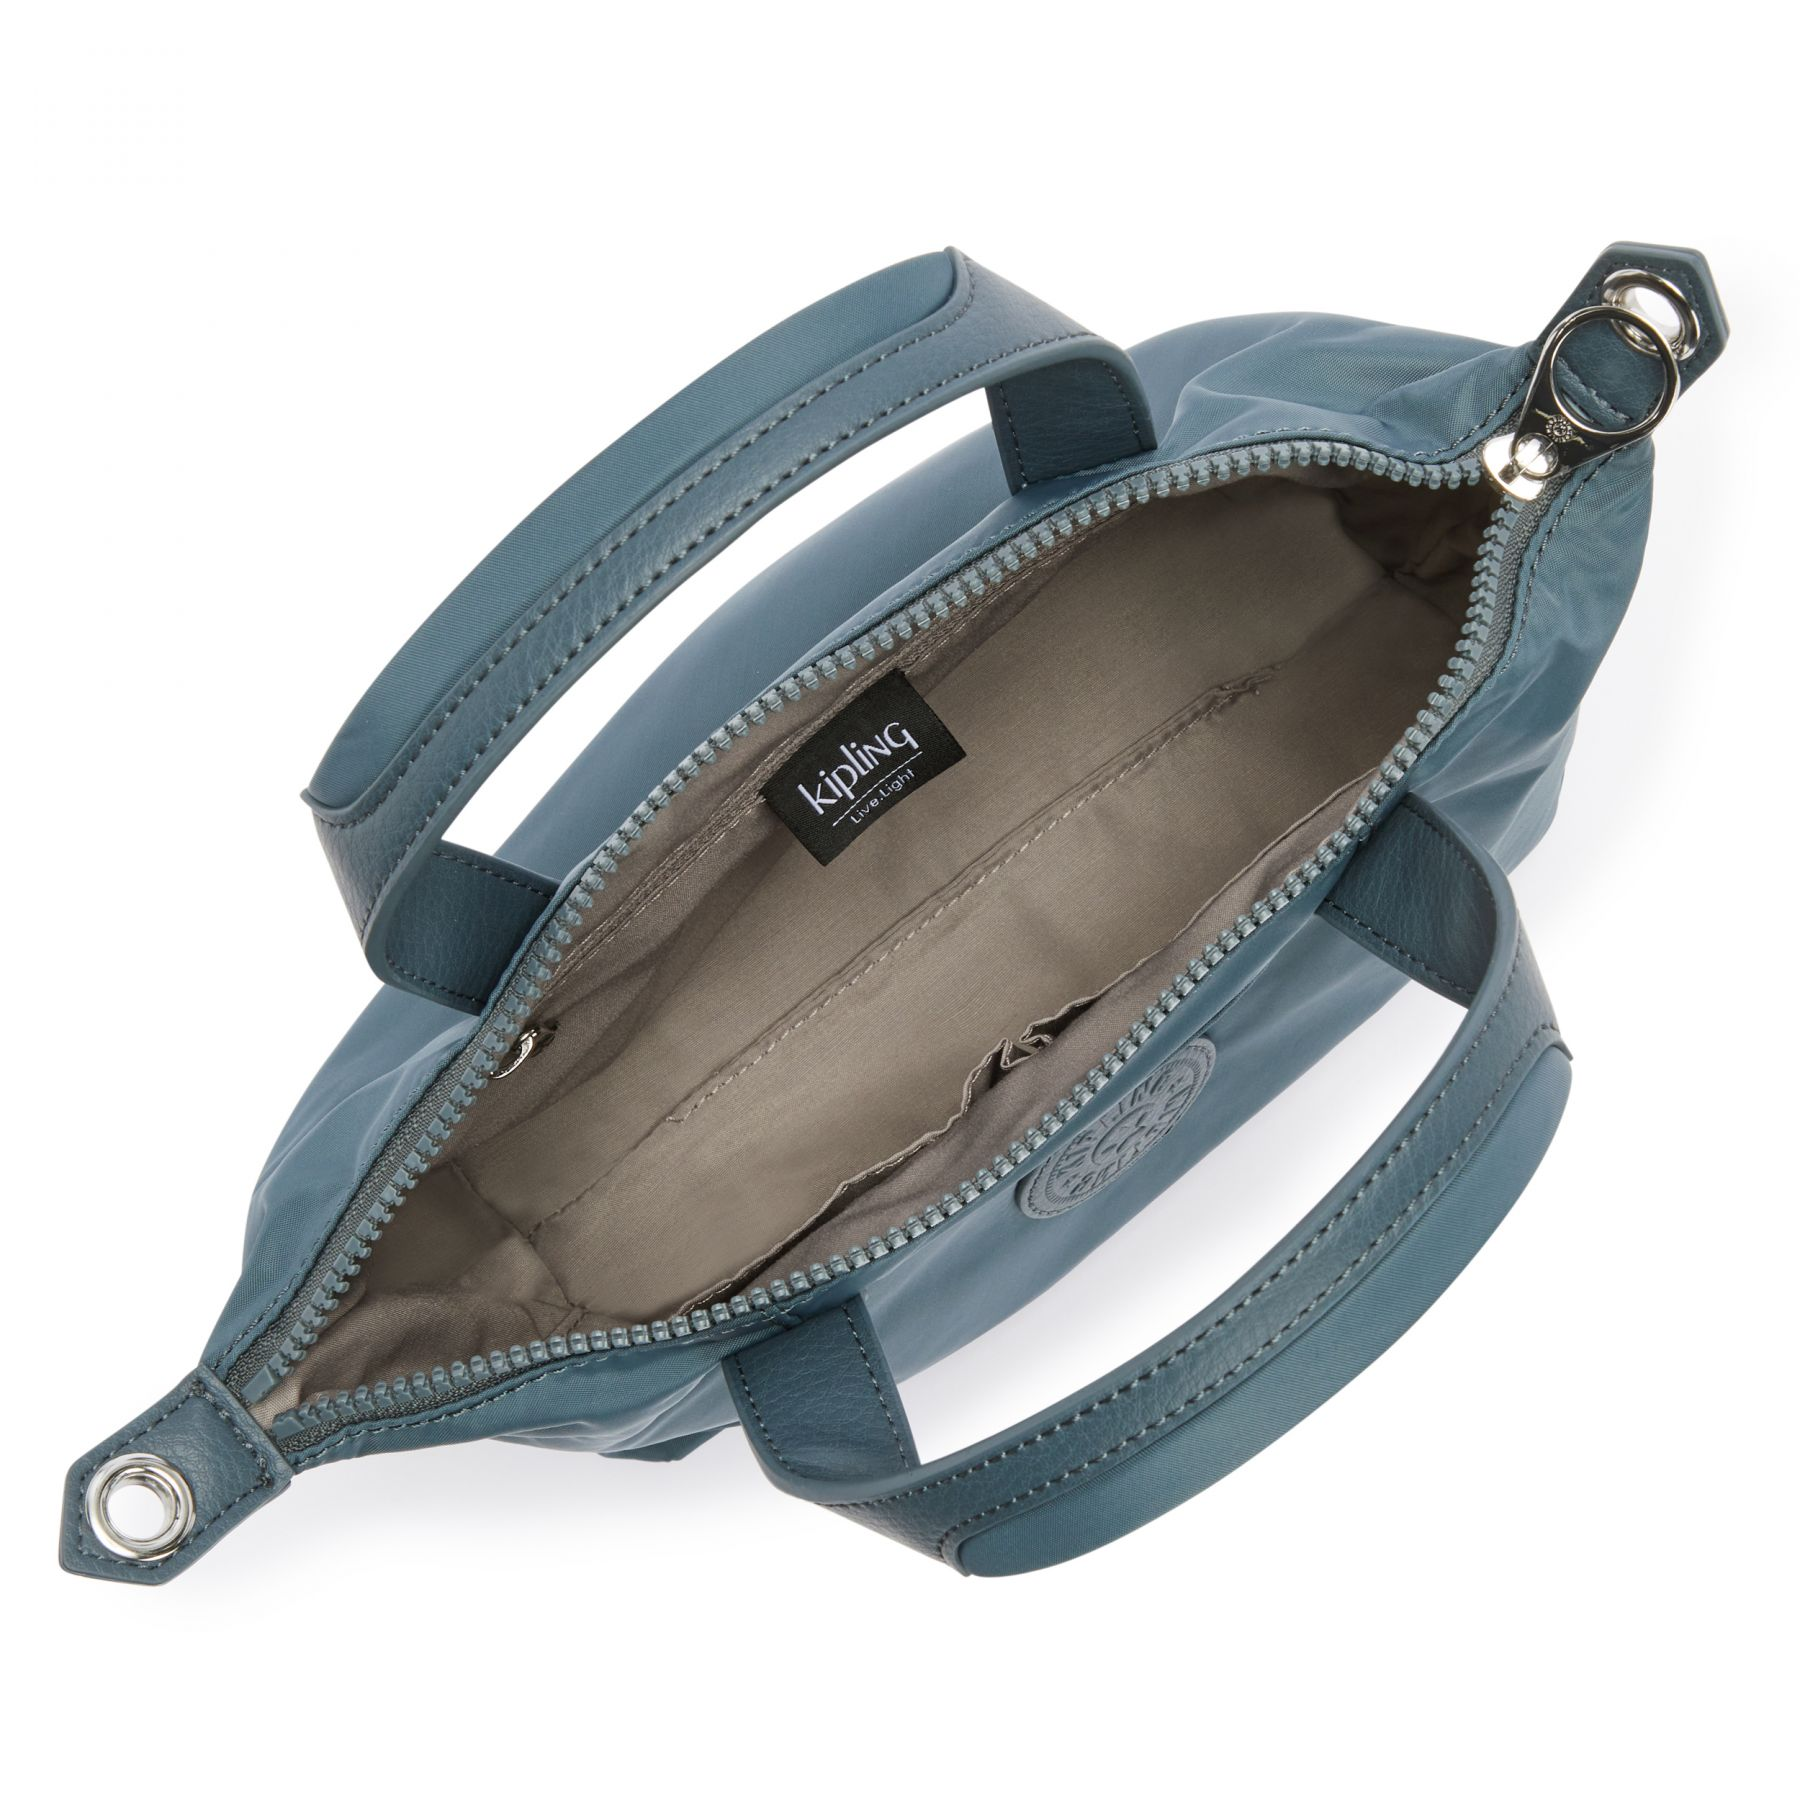 KALA COMPACT BAGS by Kipling